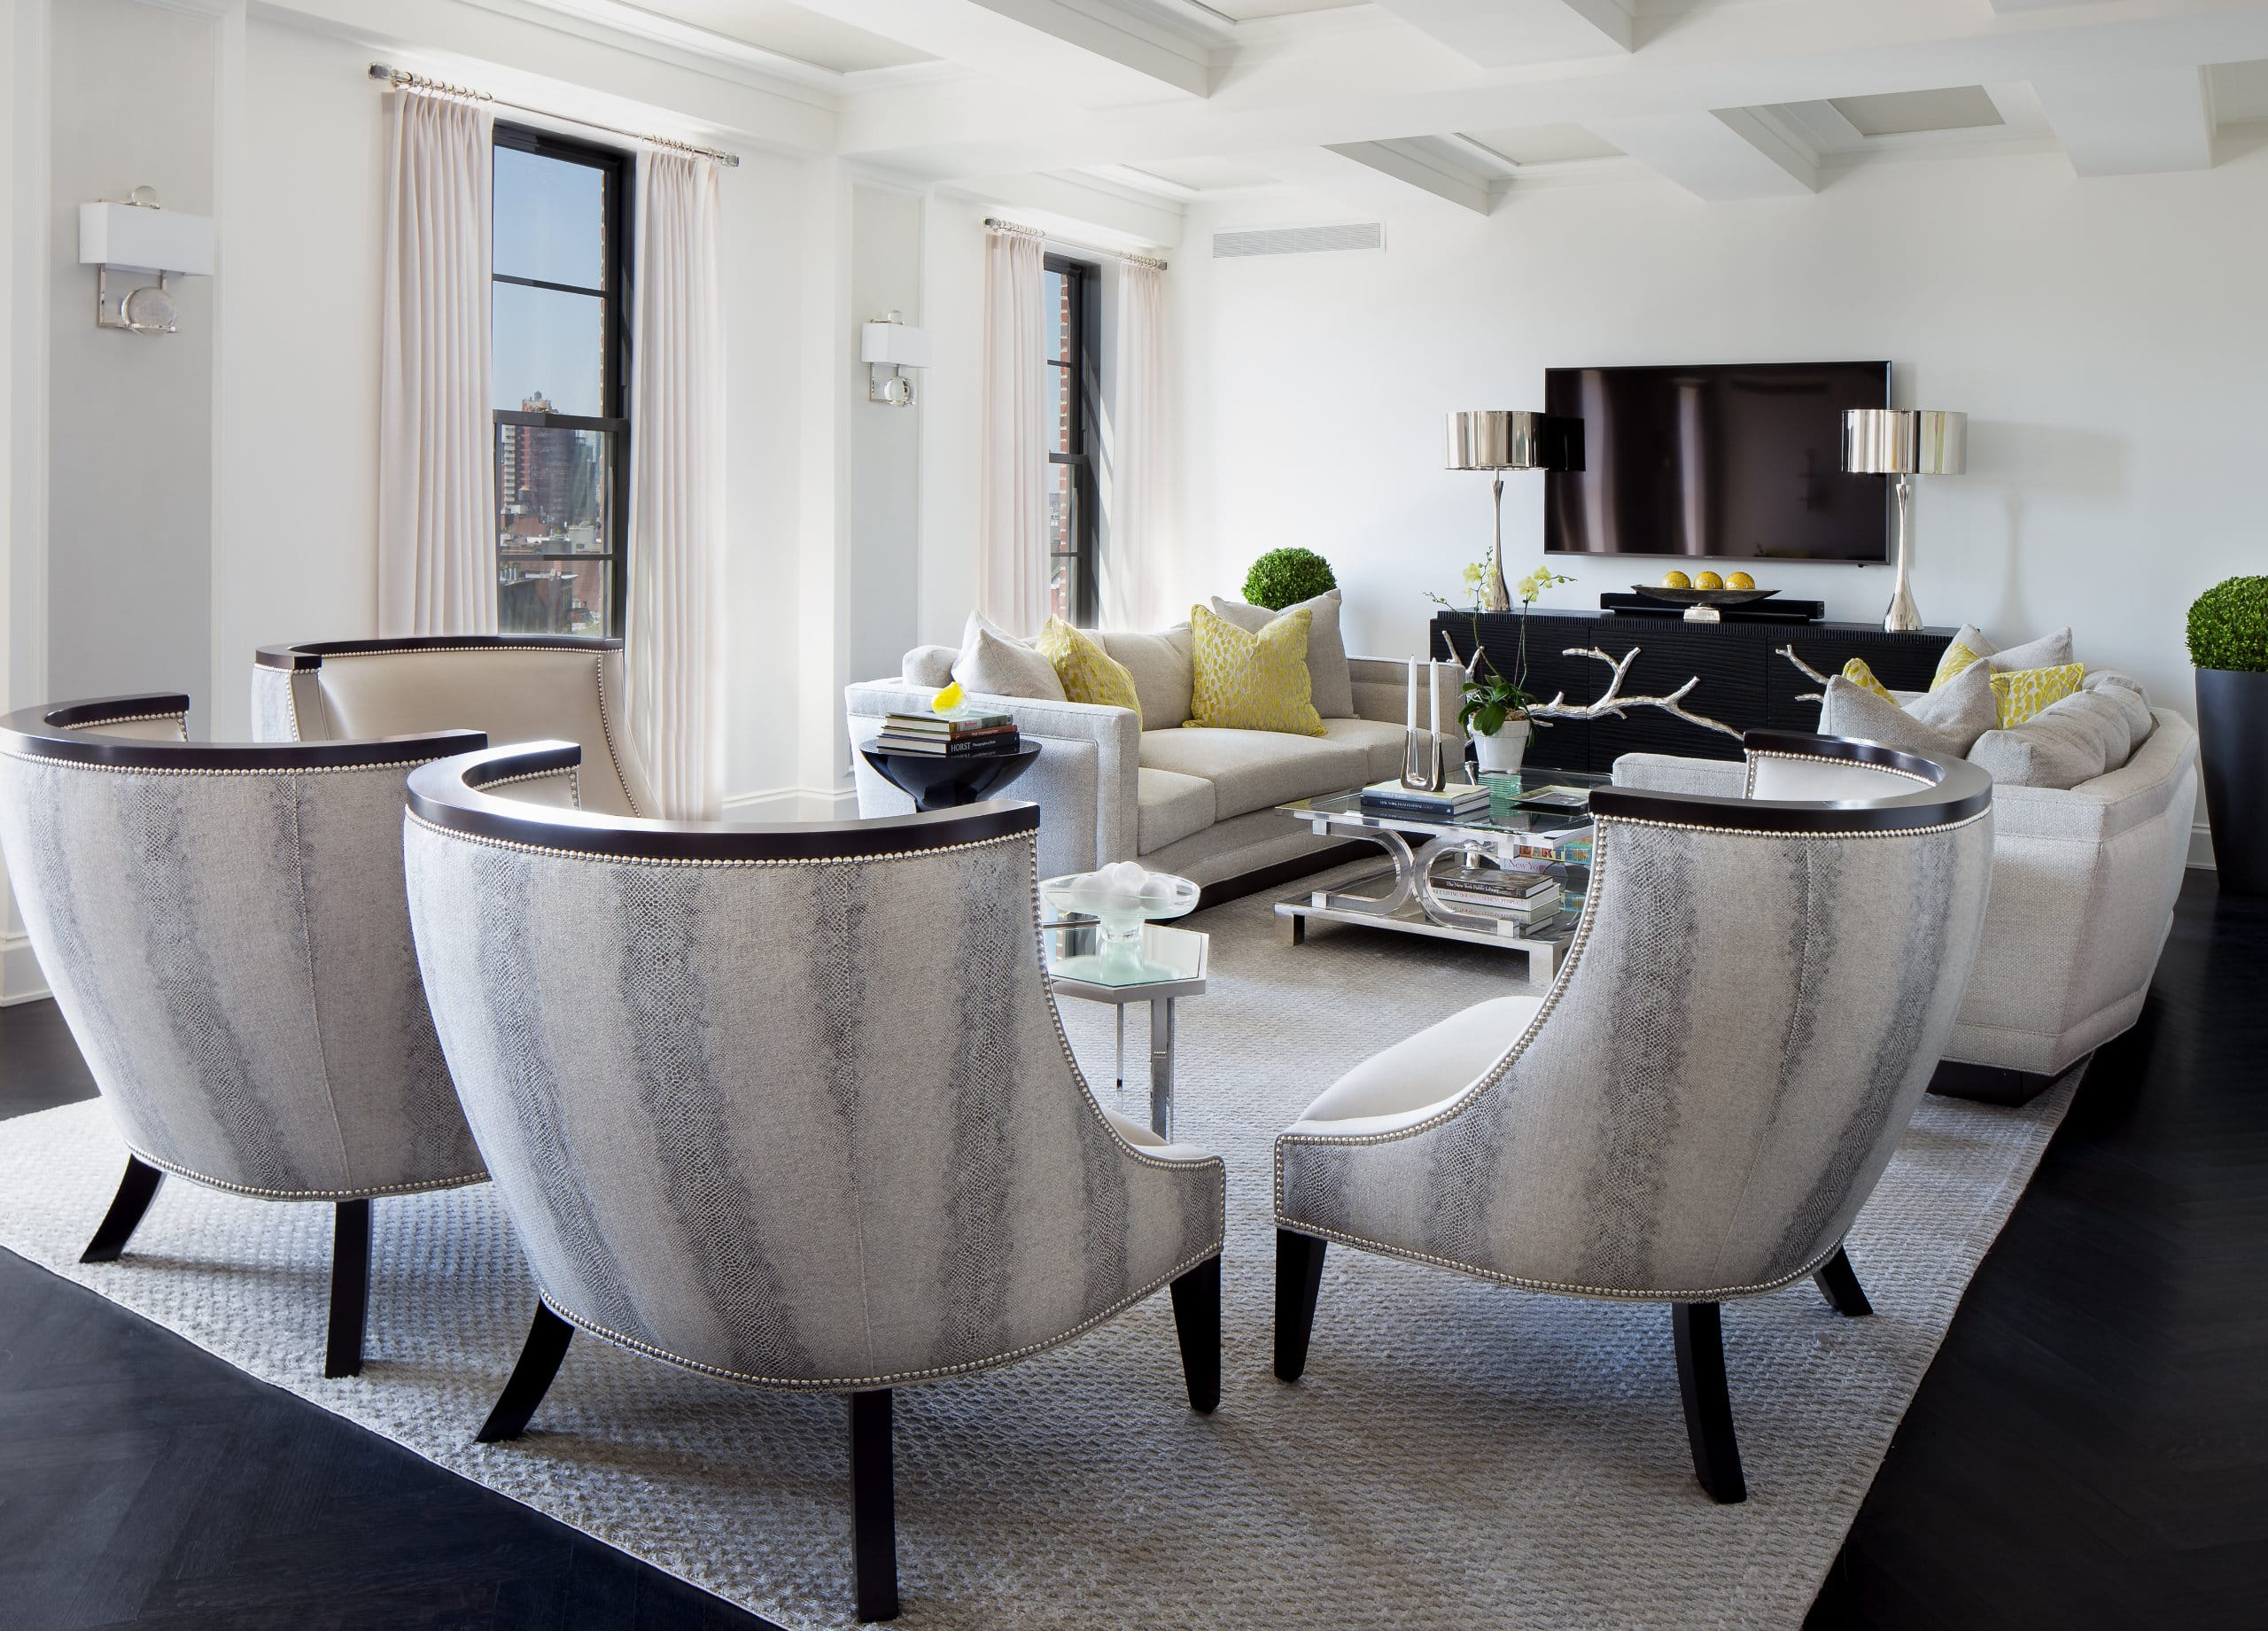 Penthouse, New York City, NY